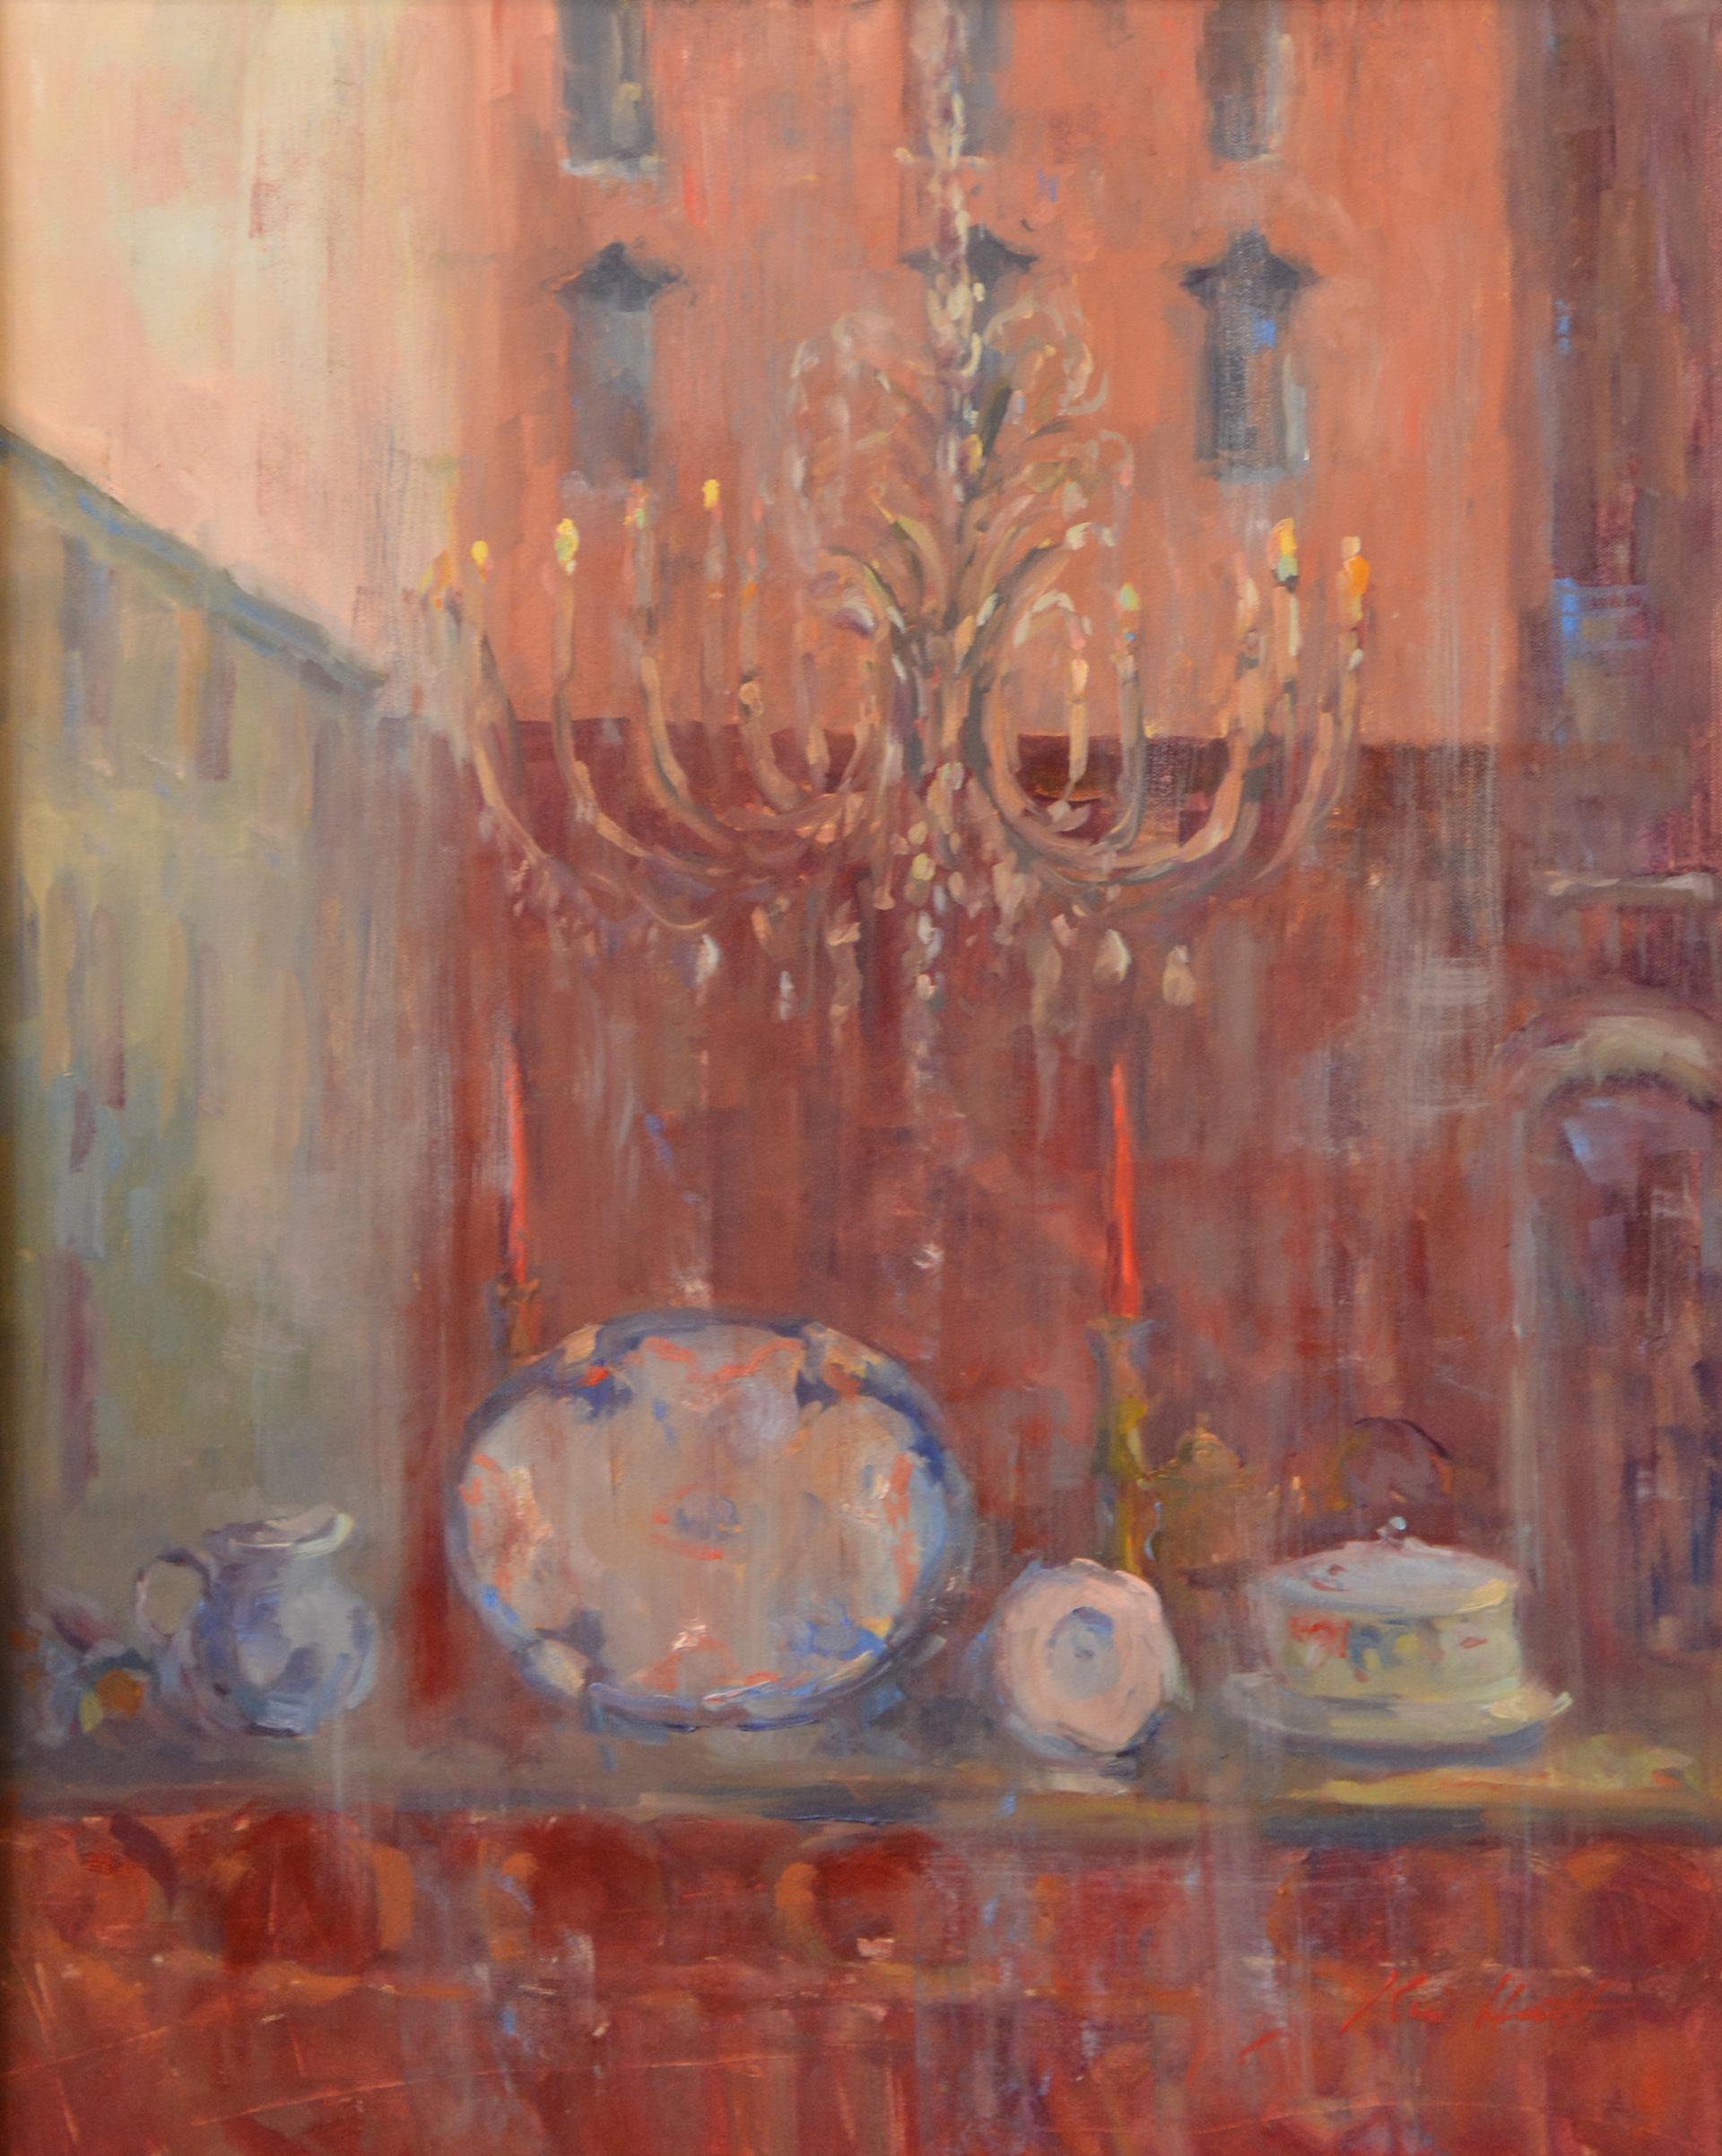 Antique Reflections by Karen Hewitt Hagan